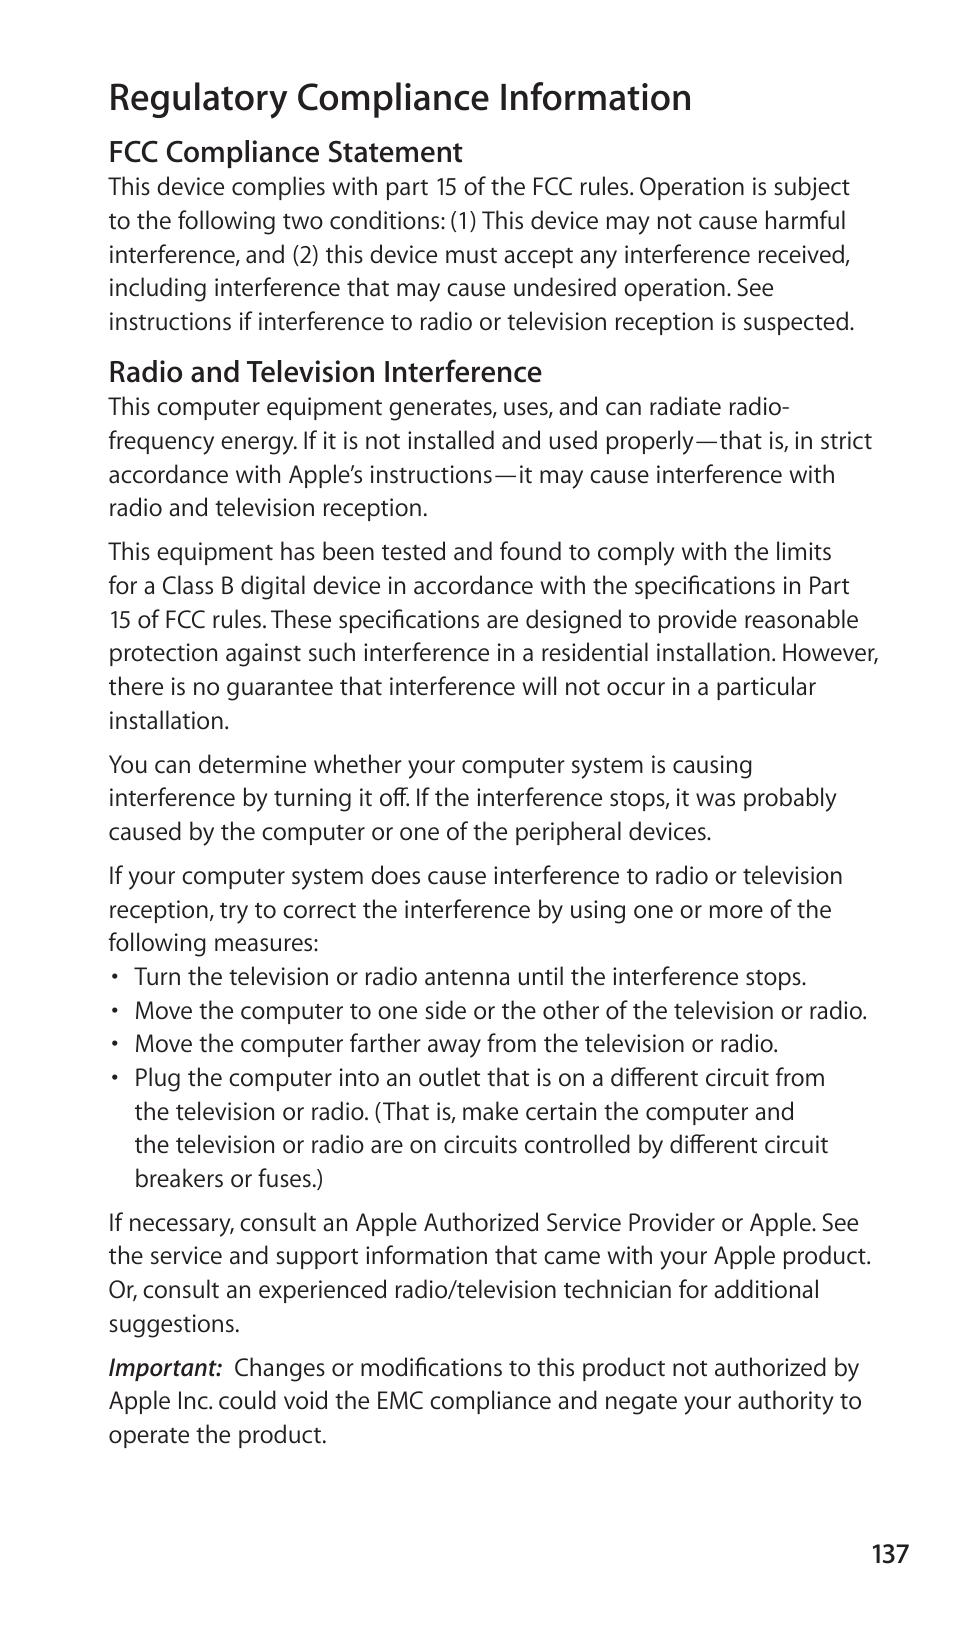 Regulatory compliance information | Apple Nike + iPod Sensor User Manual |  Page 137 / 144